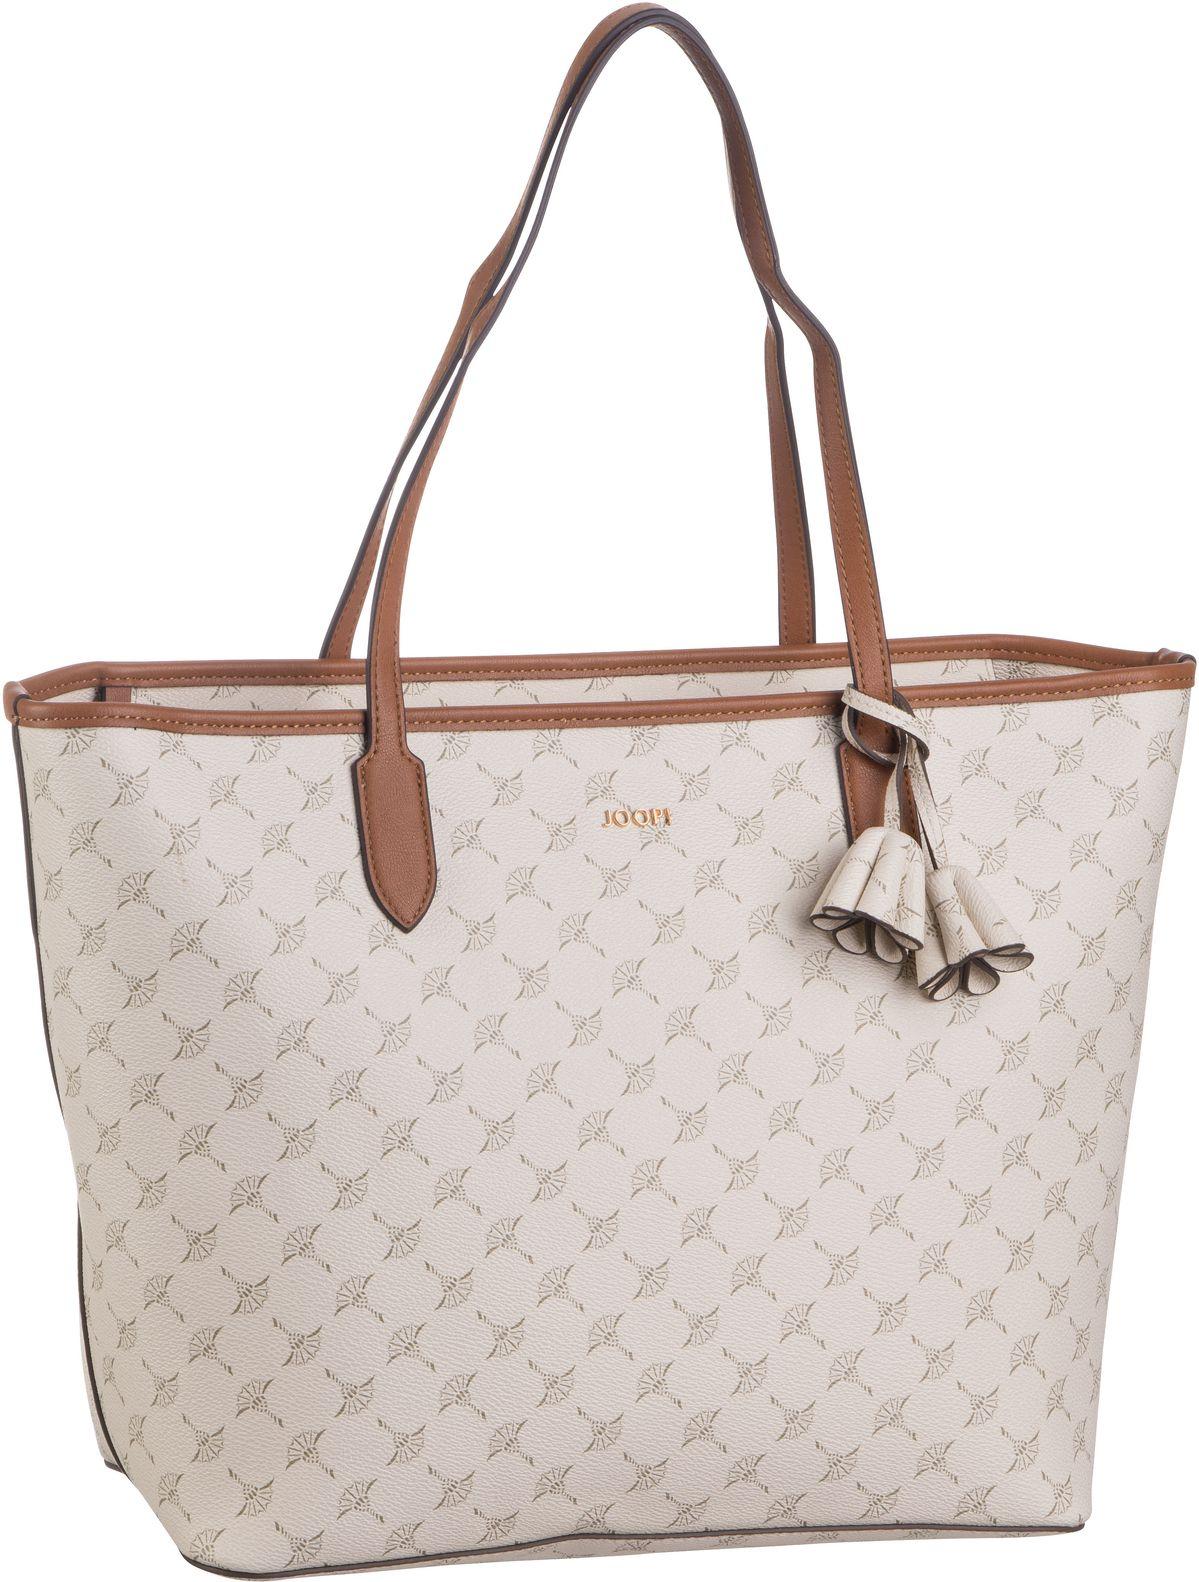 Handtasche Cortina Lara Shopper LHZ Offwhite